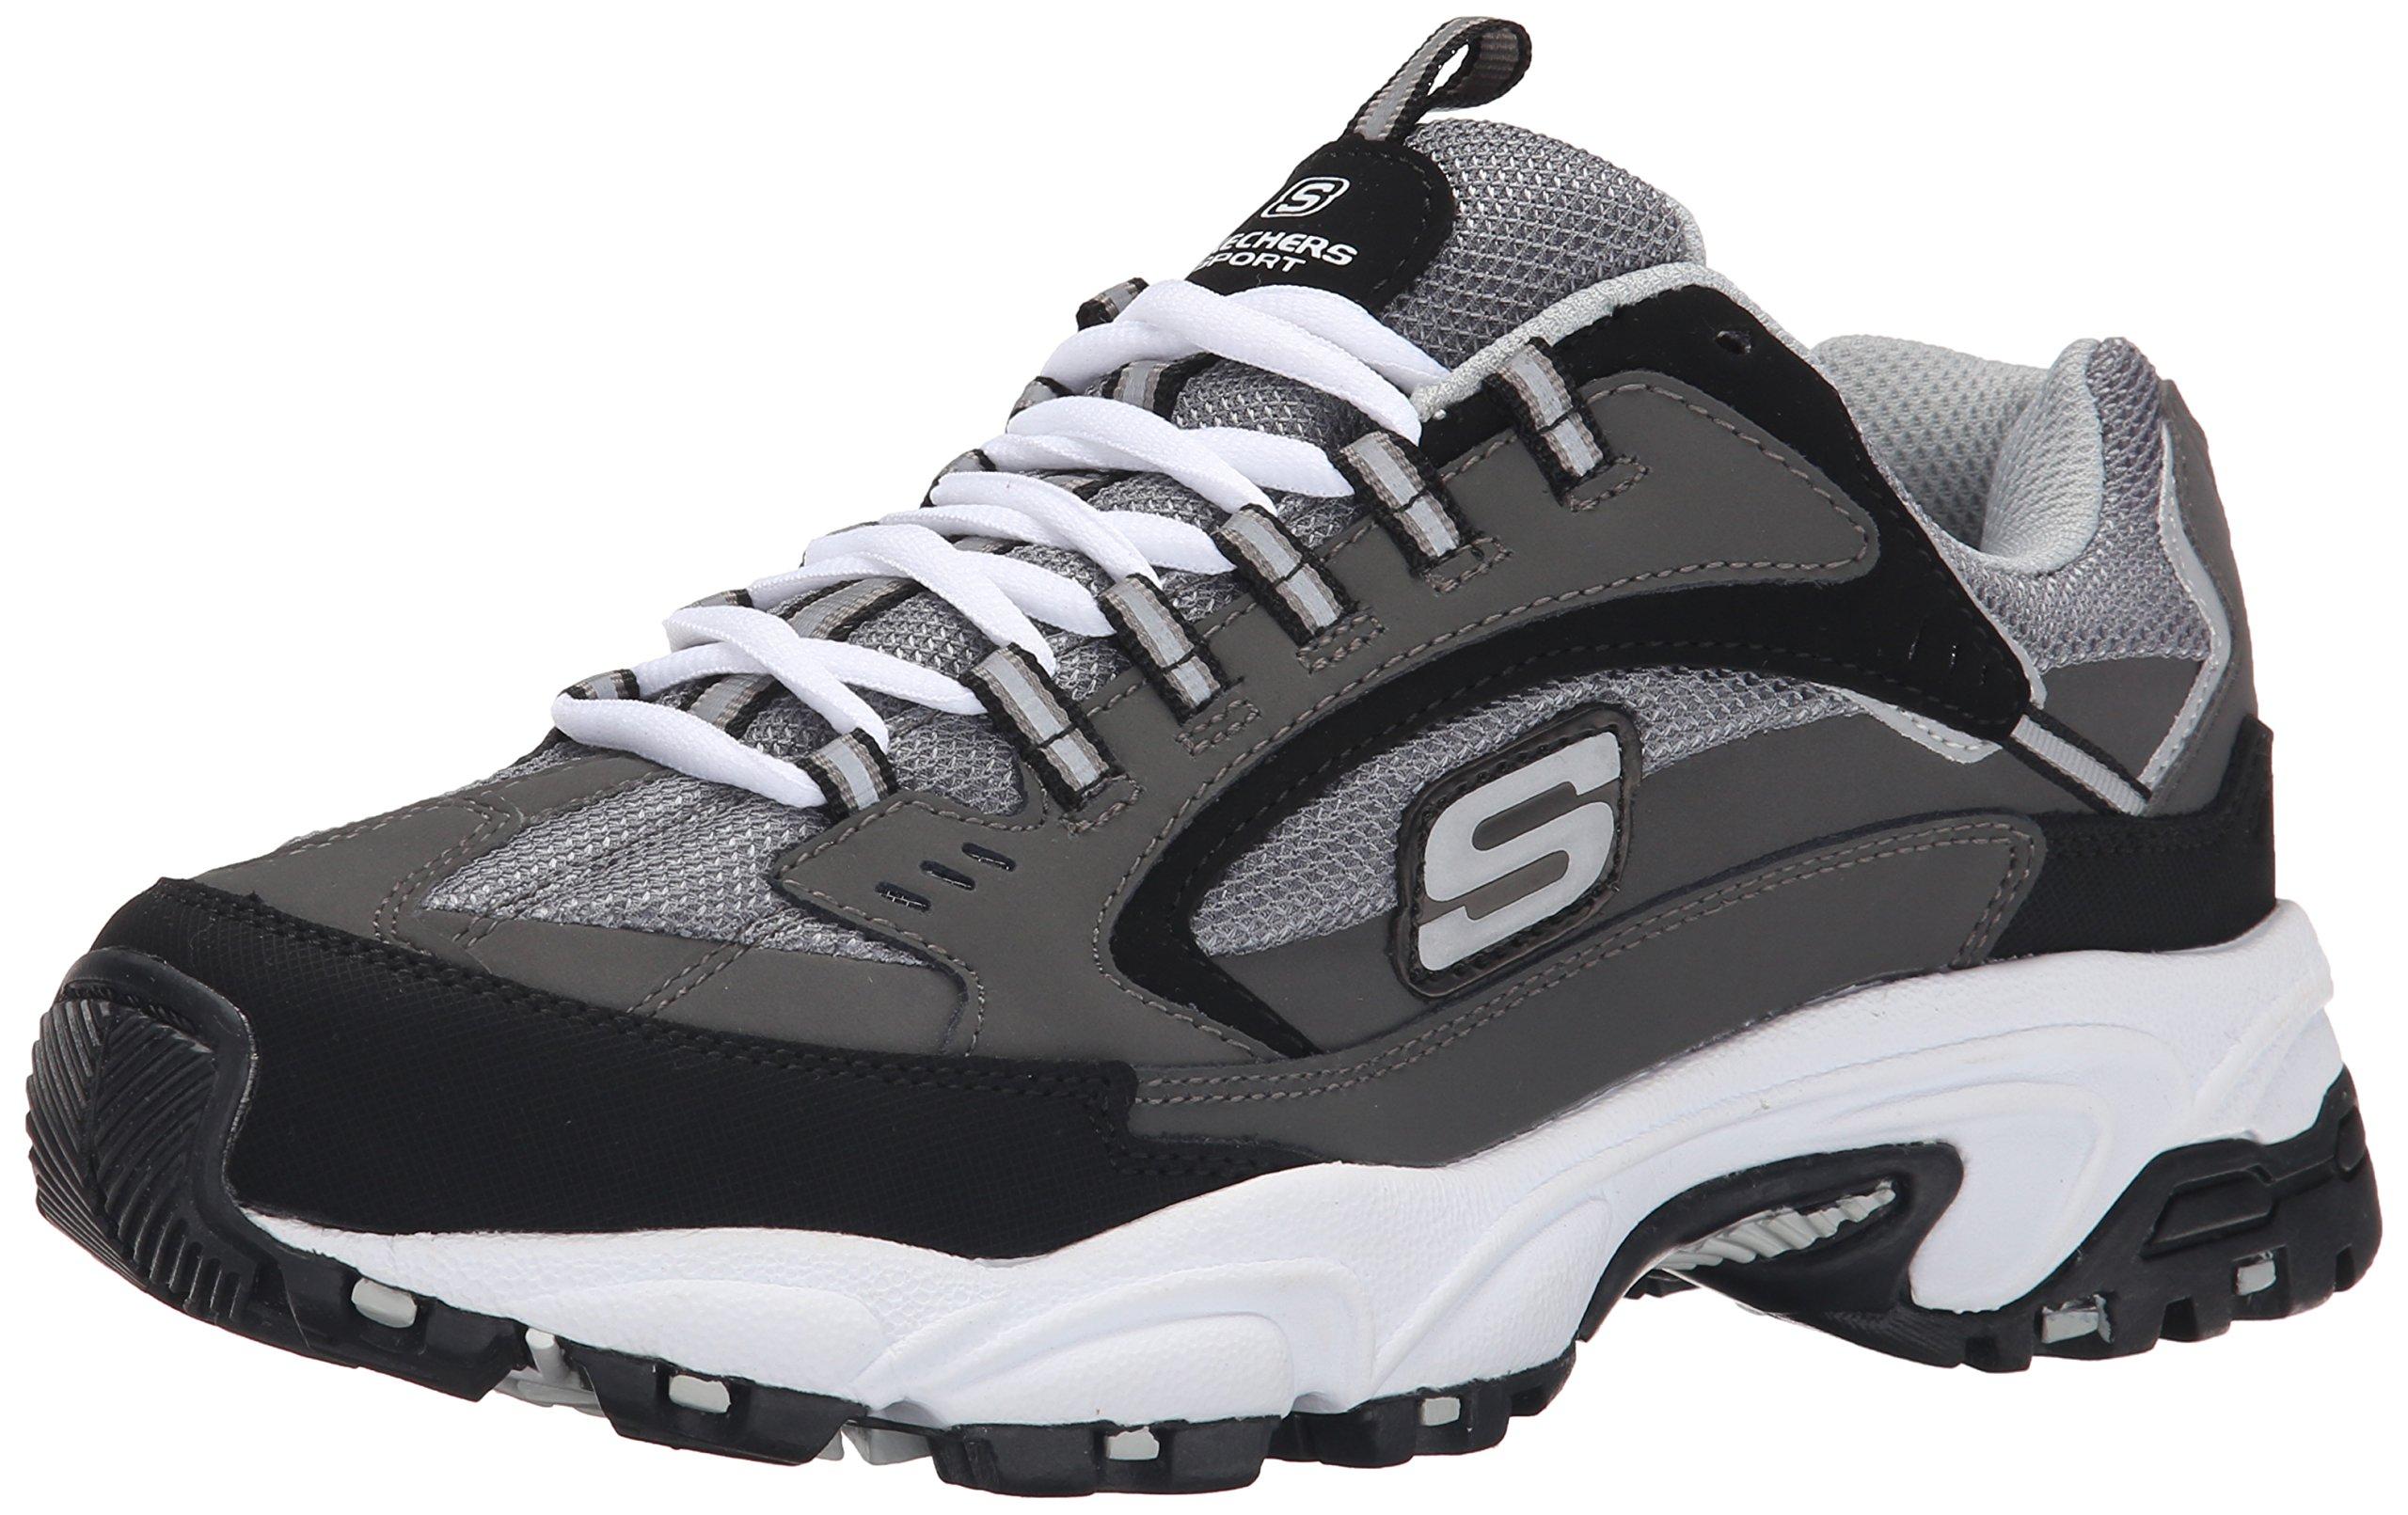 Skechers Sport Men's Stamina  Cutback Lace-Up Sneaker,Charcoal Cutback,7.5 M US